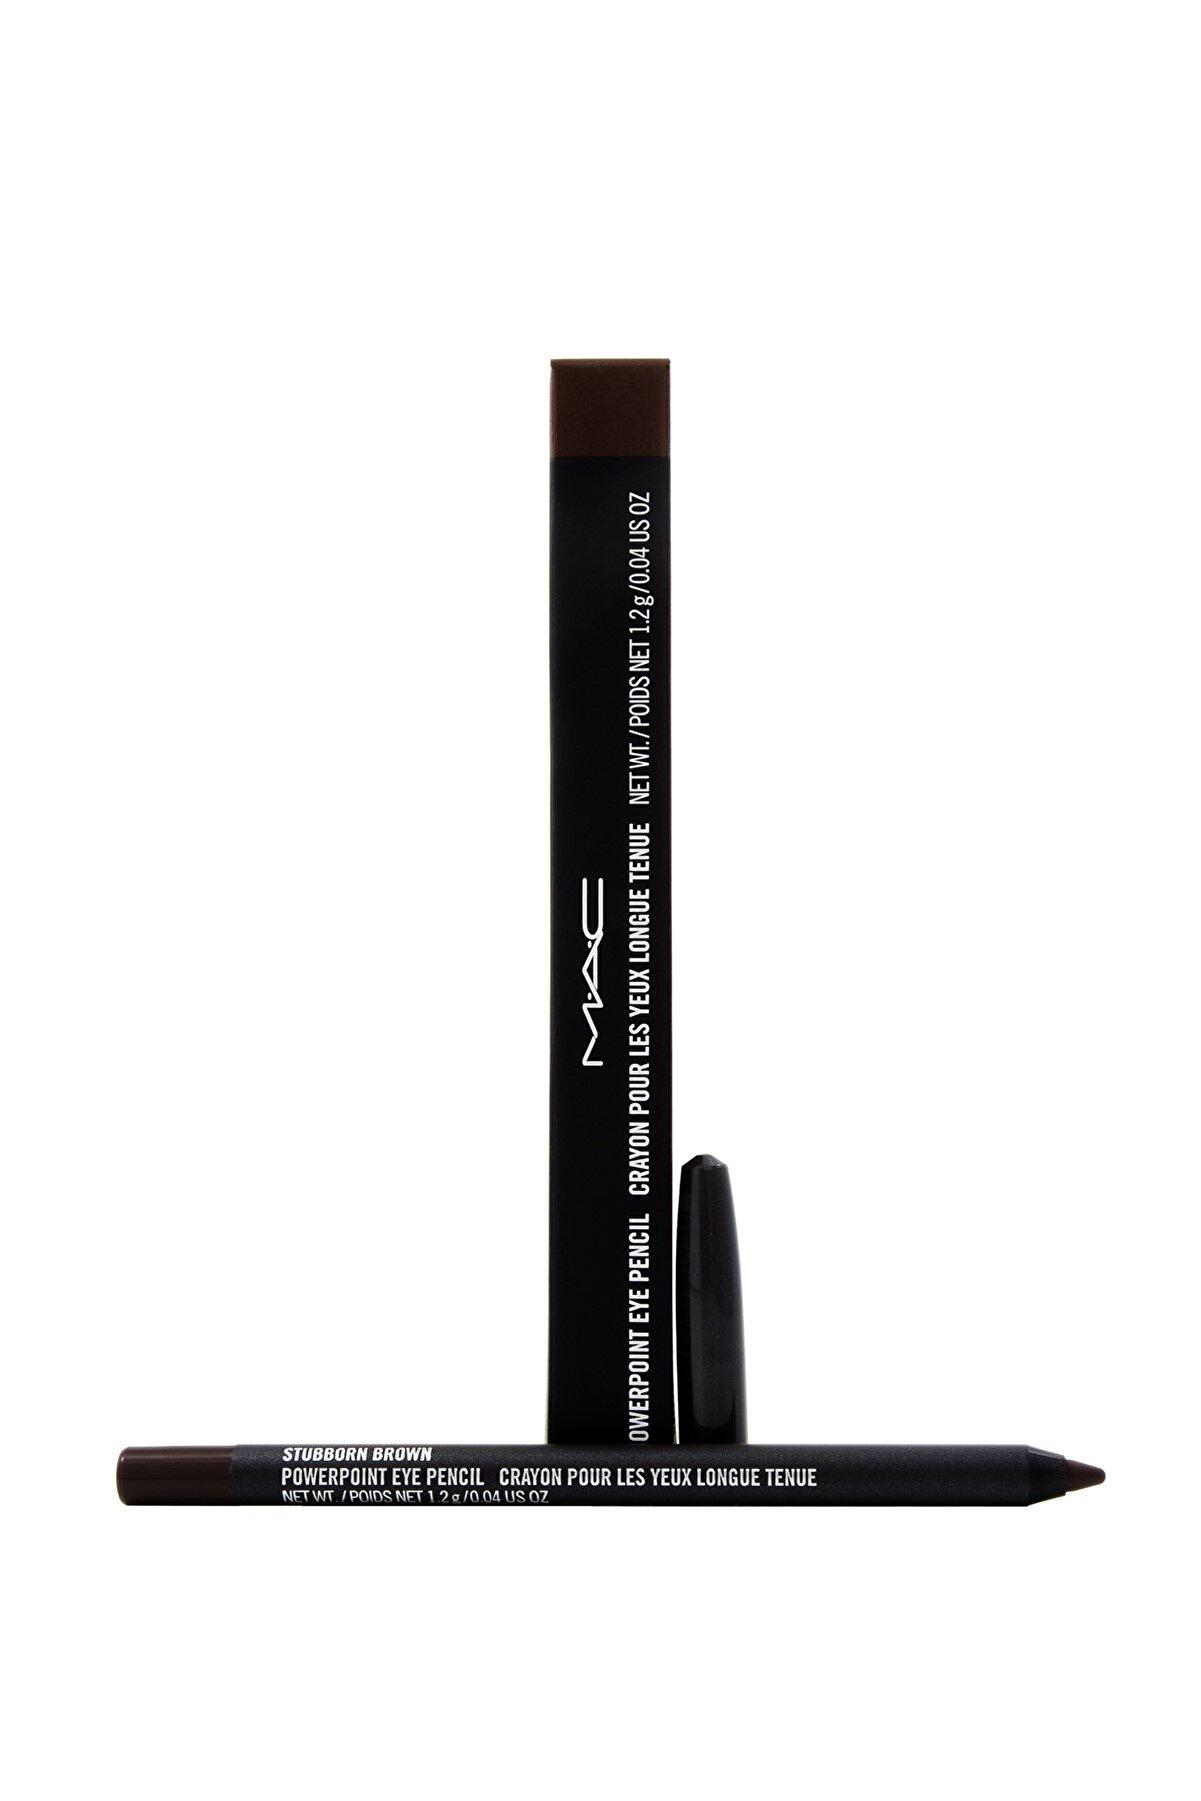 Mac Göz Kalemi - Powerpoint Eye Pencil Stubborn Brown 1.2 g 773602054381